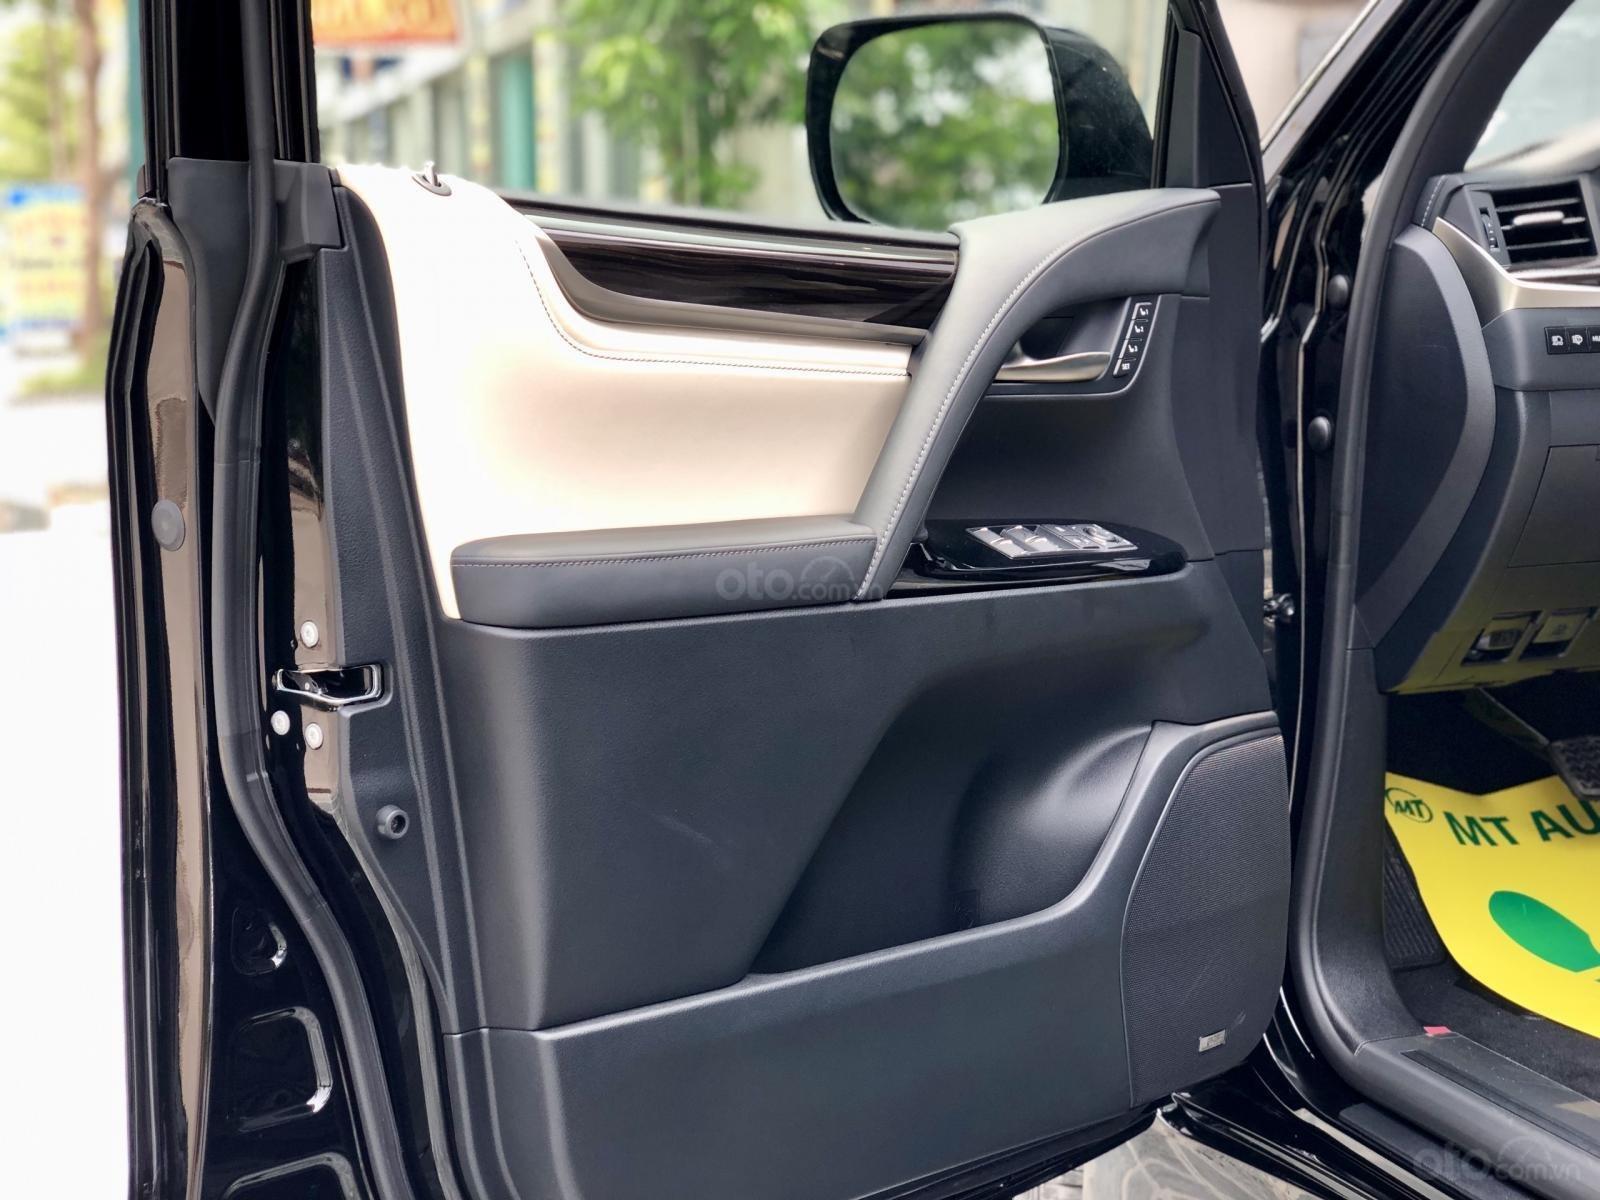 Bán Lexus LX 570 Inspiration Series 2019 bản giới hạn, LH 0945392468-24